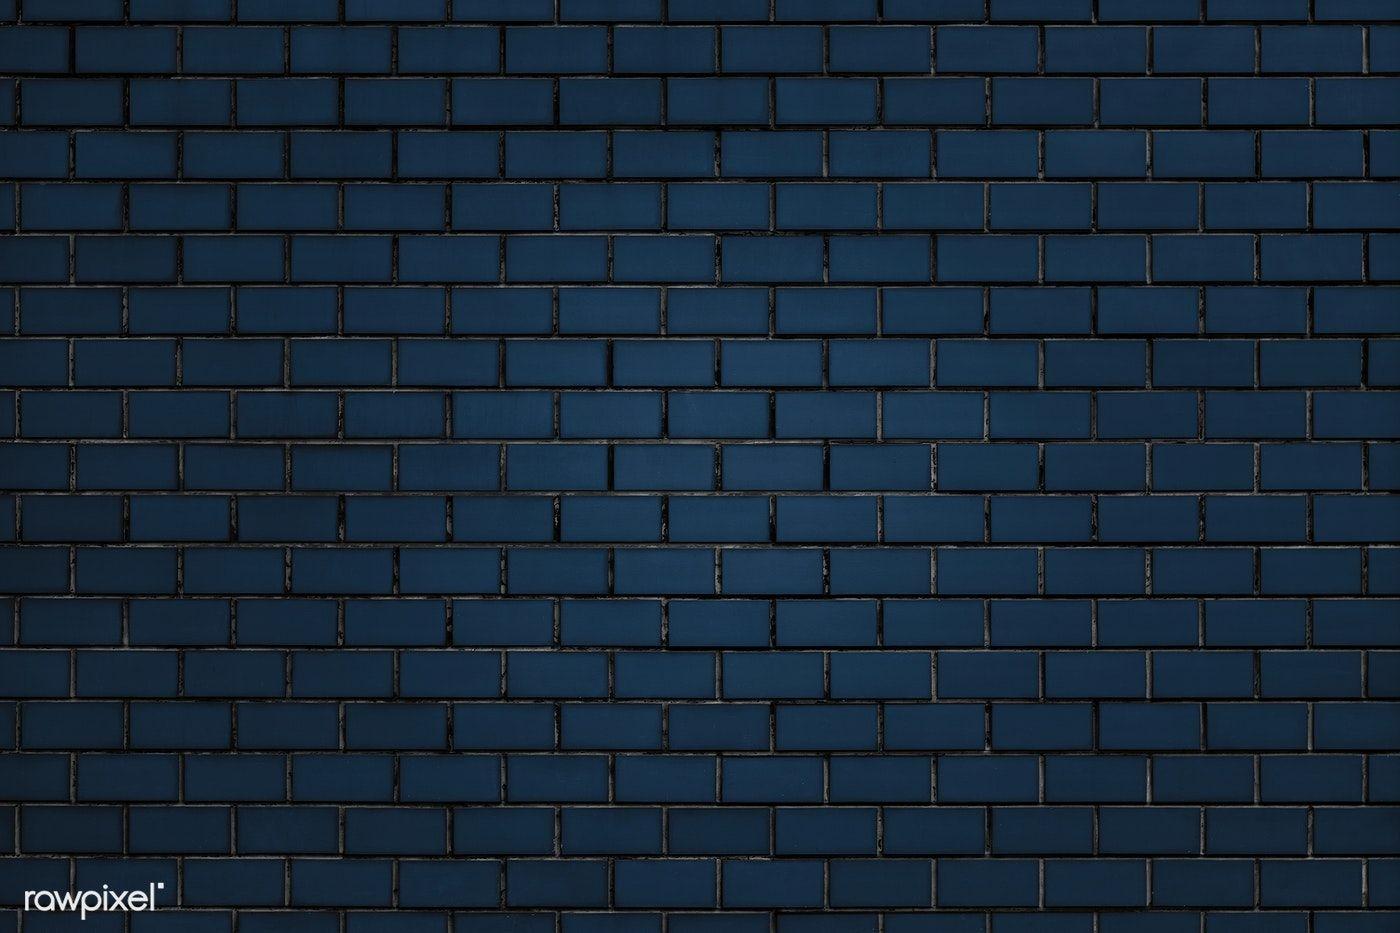 Blue Brick Wall Textured Background Free Image By Rawpixel Com Ake Chim Brick Wall Background Textured Background Brick Wall